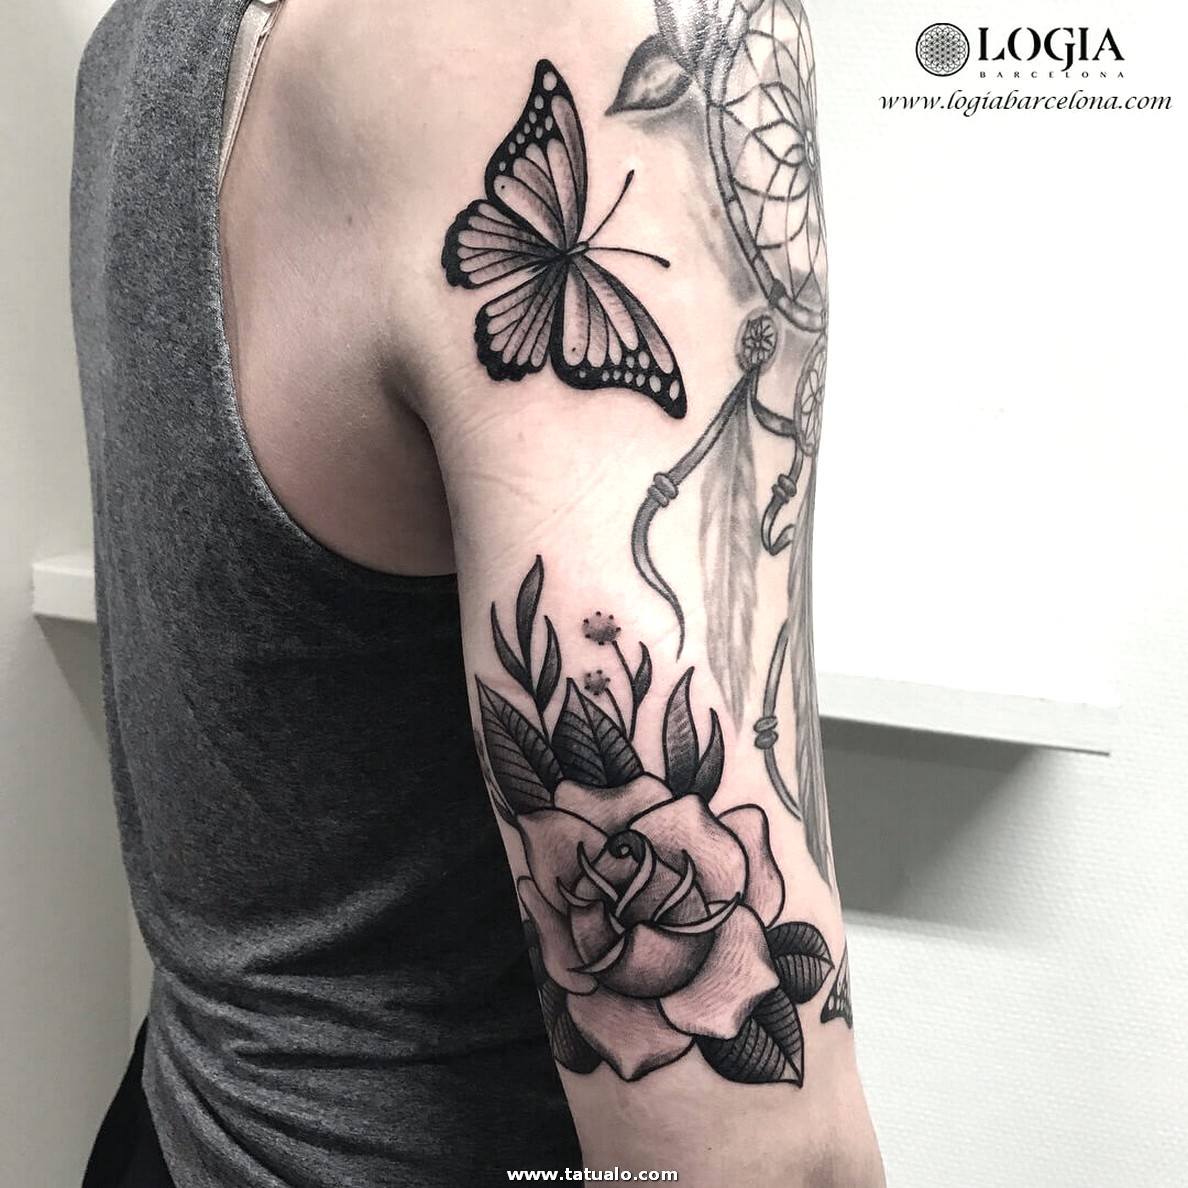 Tatuaje Rosa Mariposa Brazo Logia Barcelona Laia